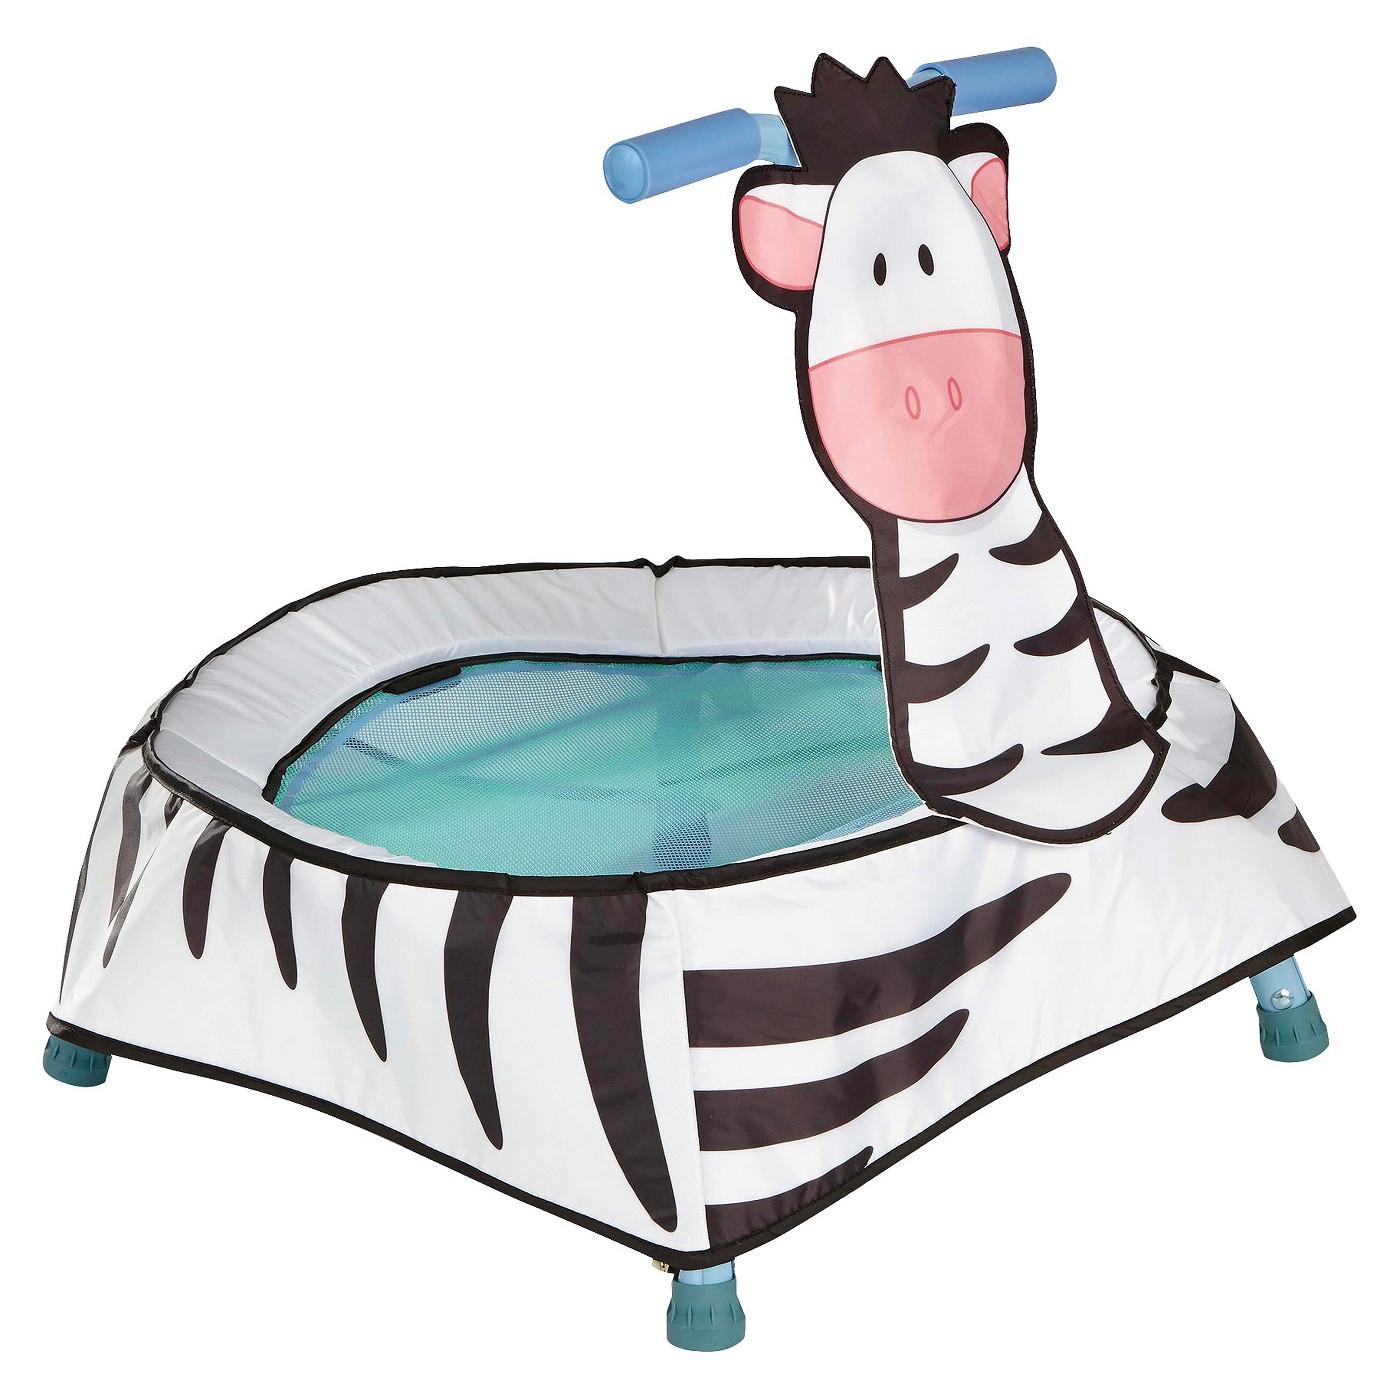 Diggin Boing Boing Zebra Toddler Trampoline